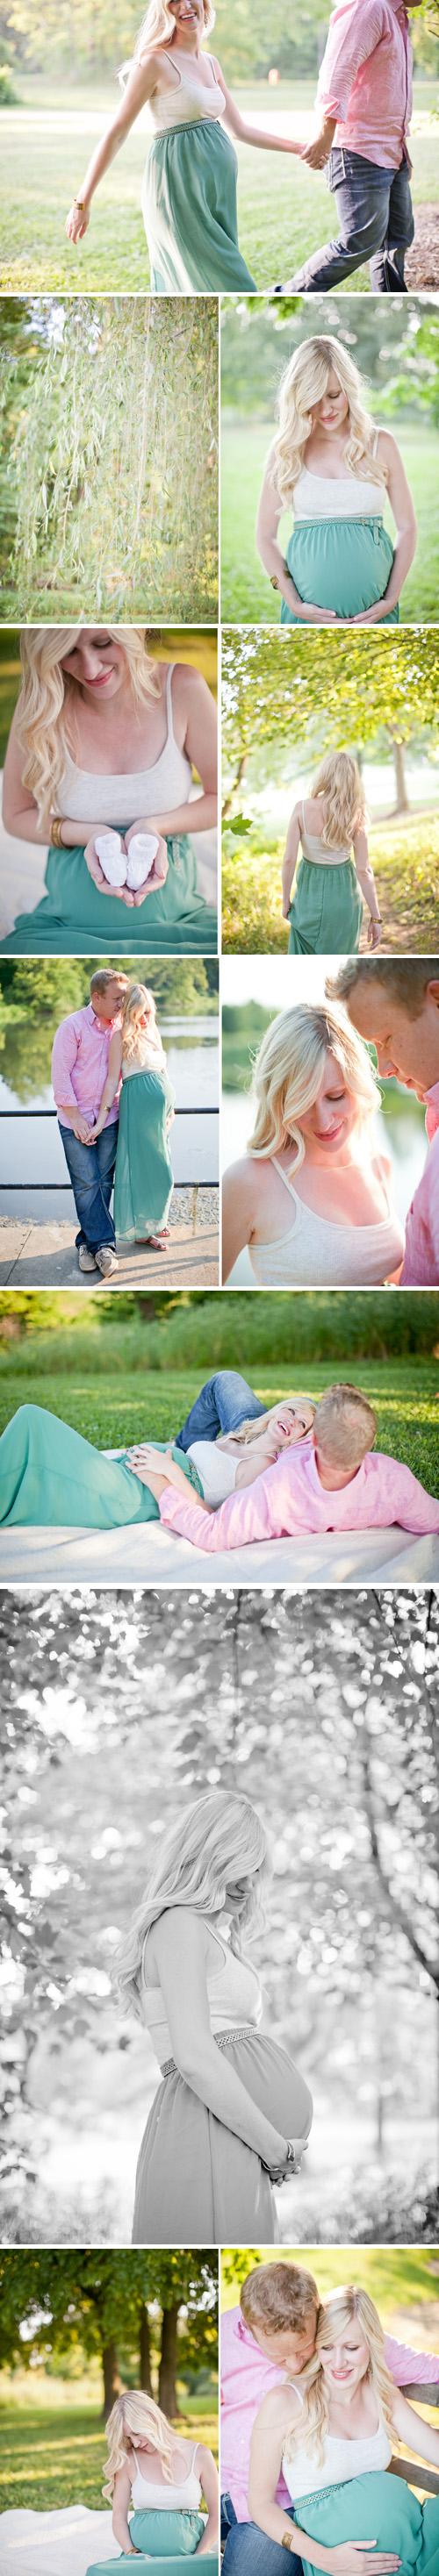 LilyGlassPhotography_Maternity